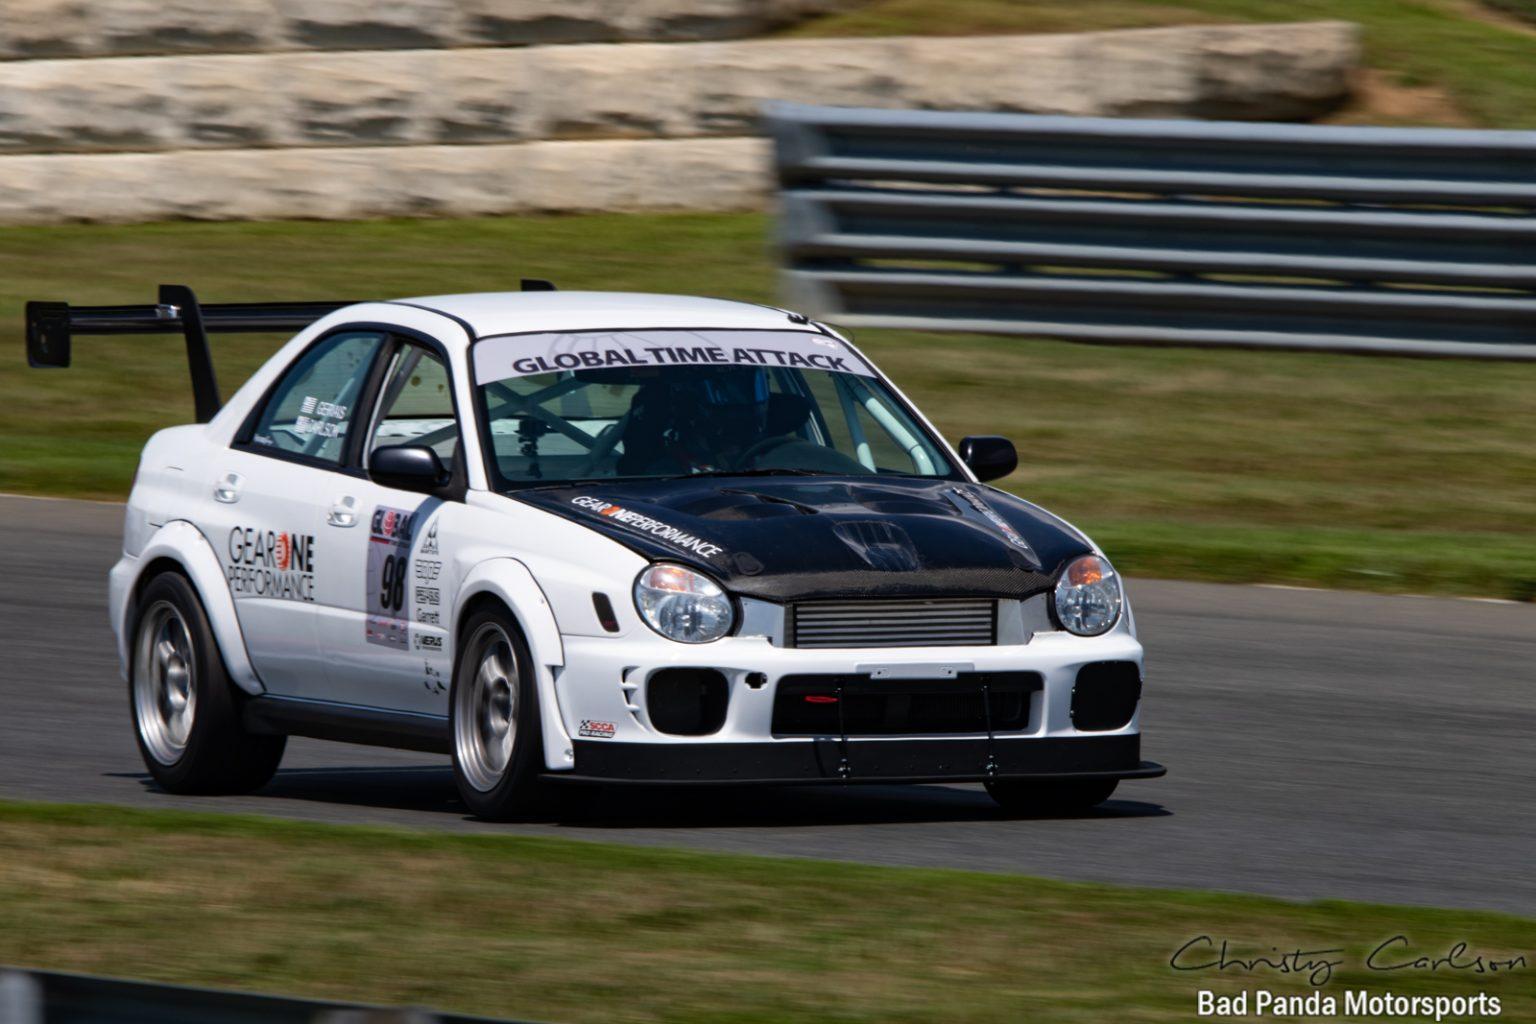 RASpec Impreza 2 0 - Subaru Impreza WRX STI Race Car - Full